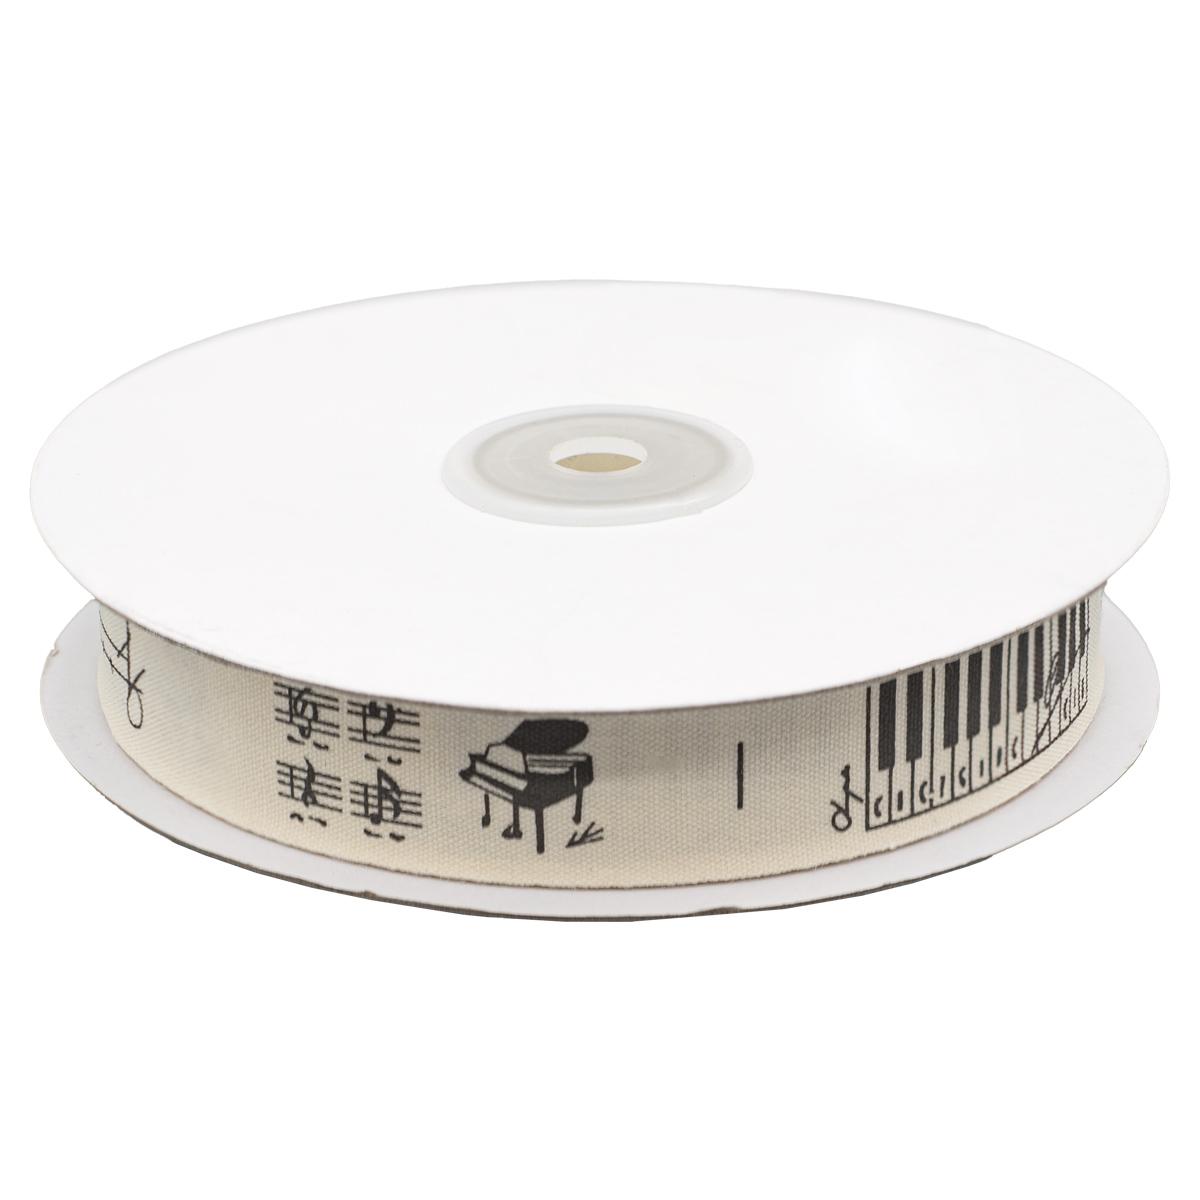 CPR021 Лента декоративная 'Музыка' 100% хб, 20мм*25м